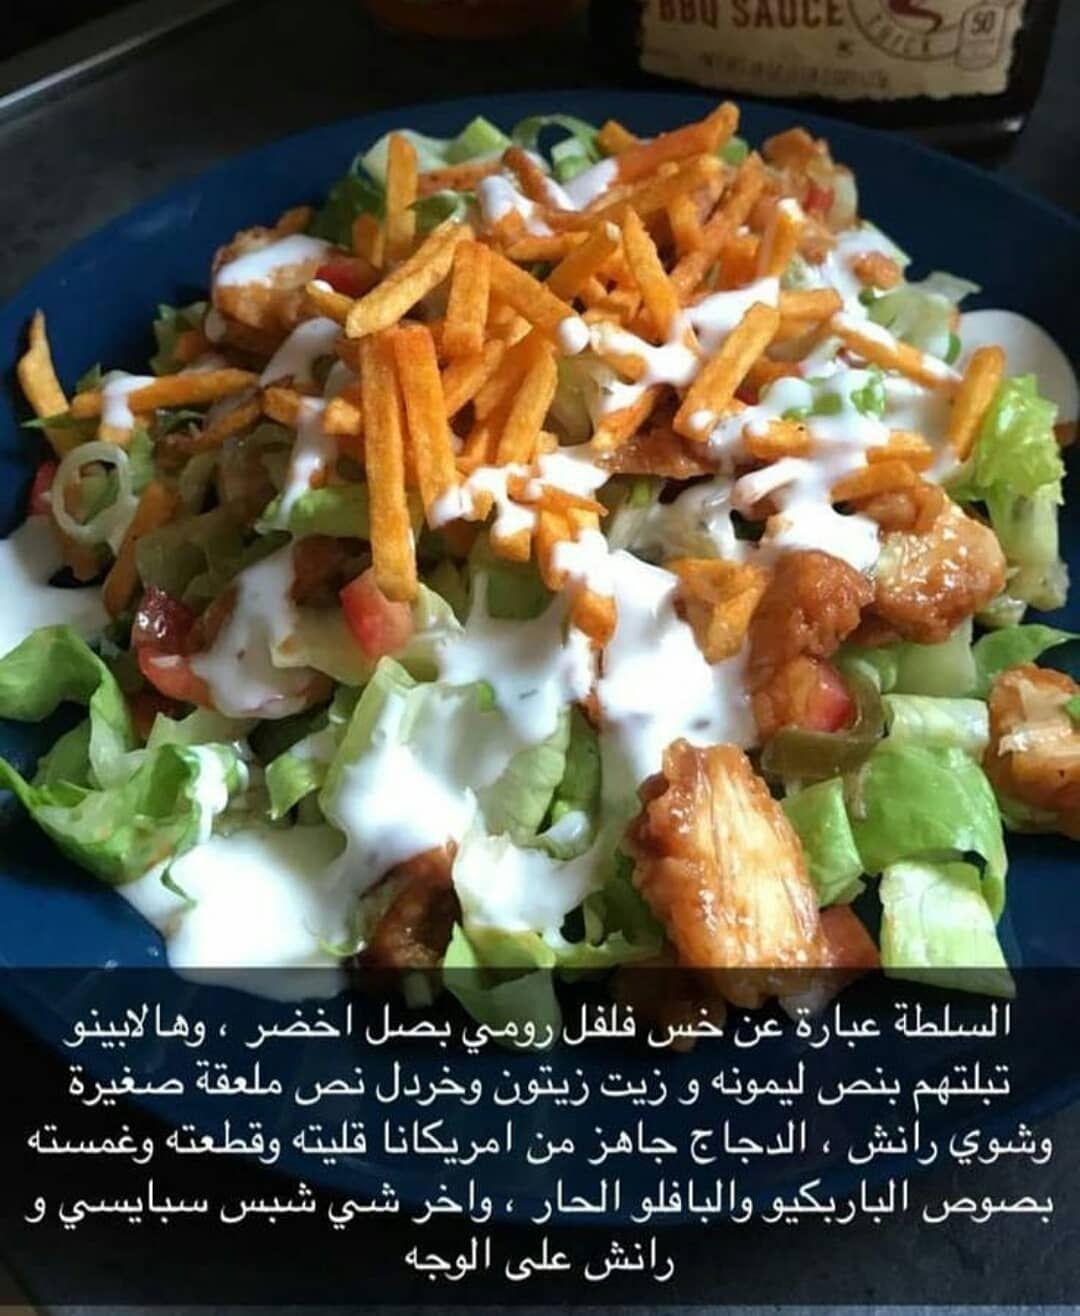 Instagram Post By Chef Aseel Nov 29 2019 At 12 01pm Utc Food Food Drinks Dessert Food Receipes